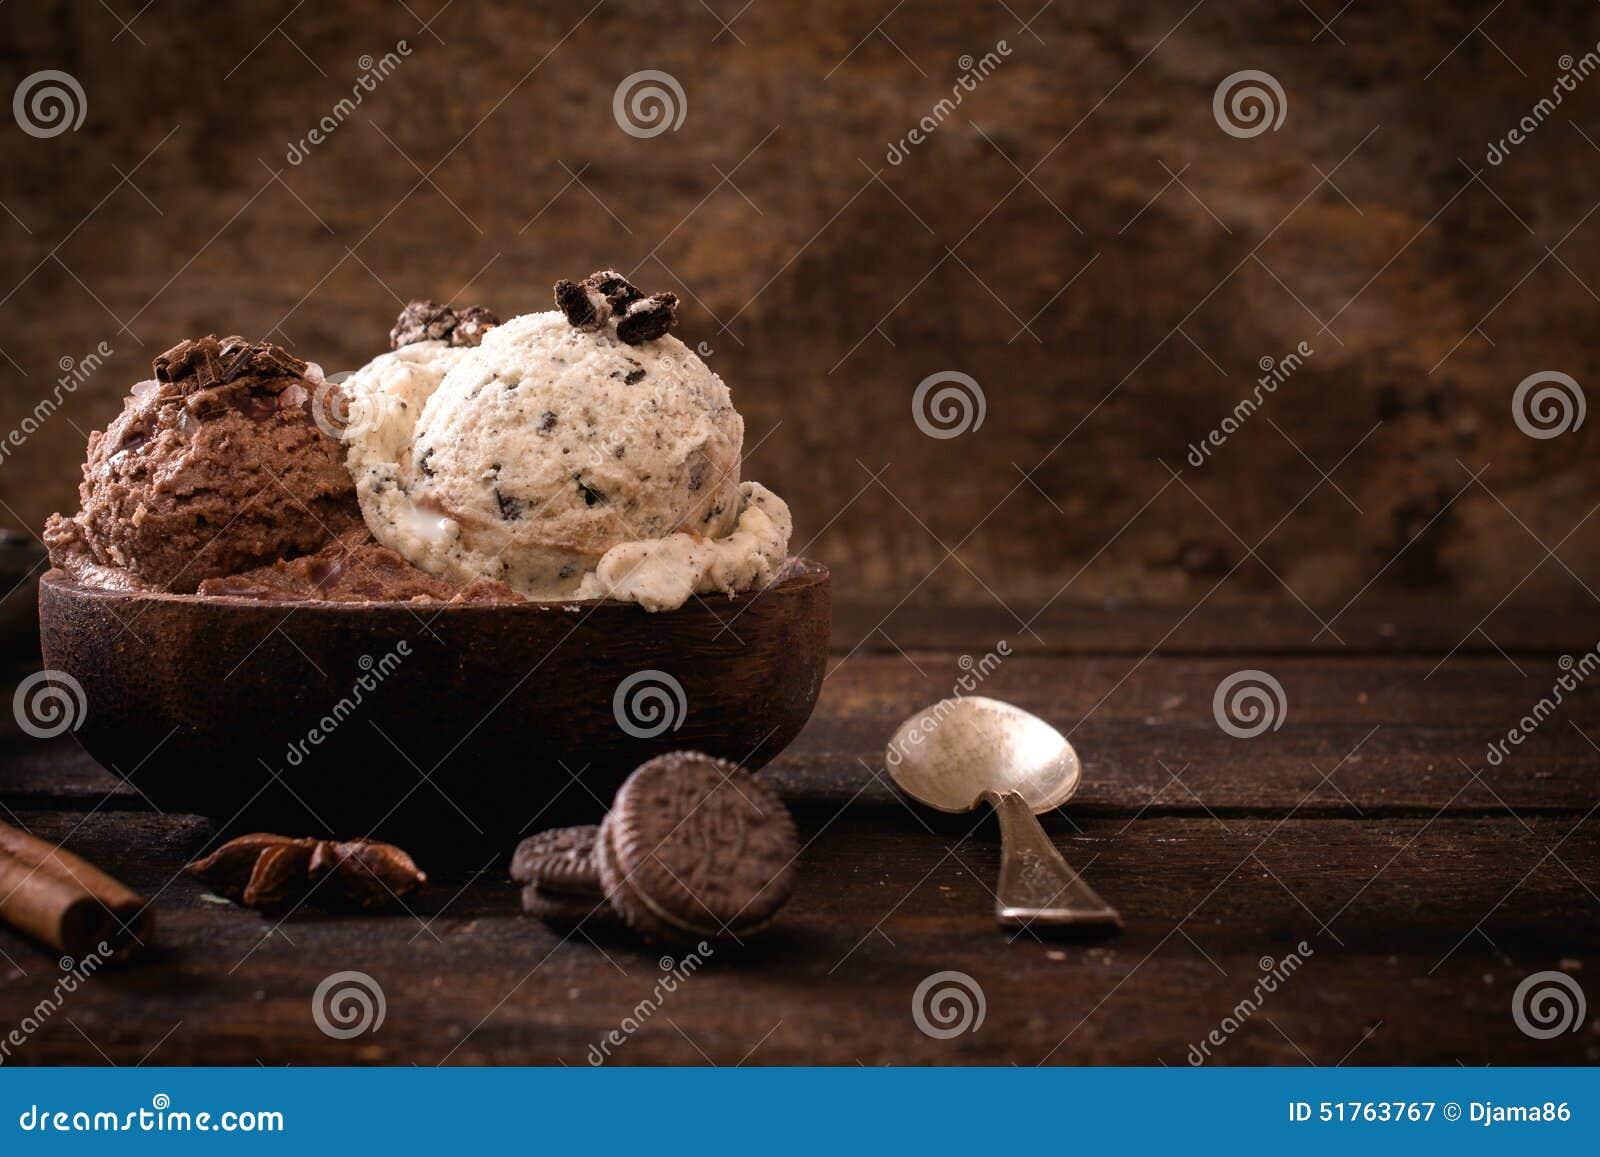 Sweet homemade ice cream